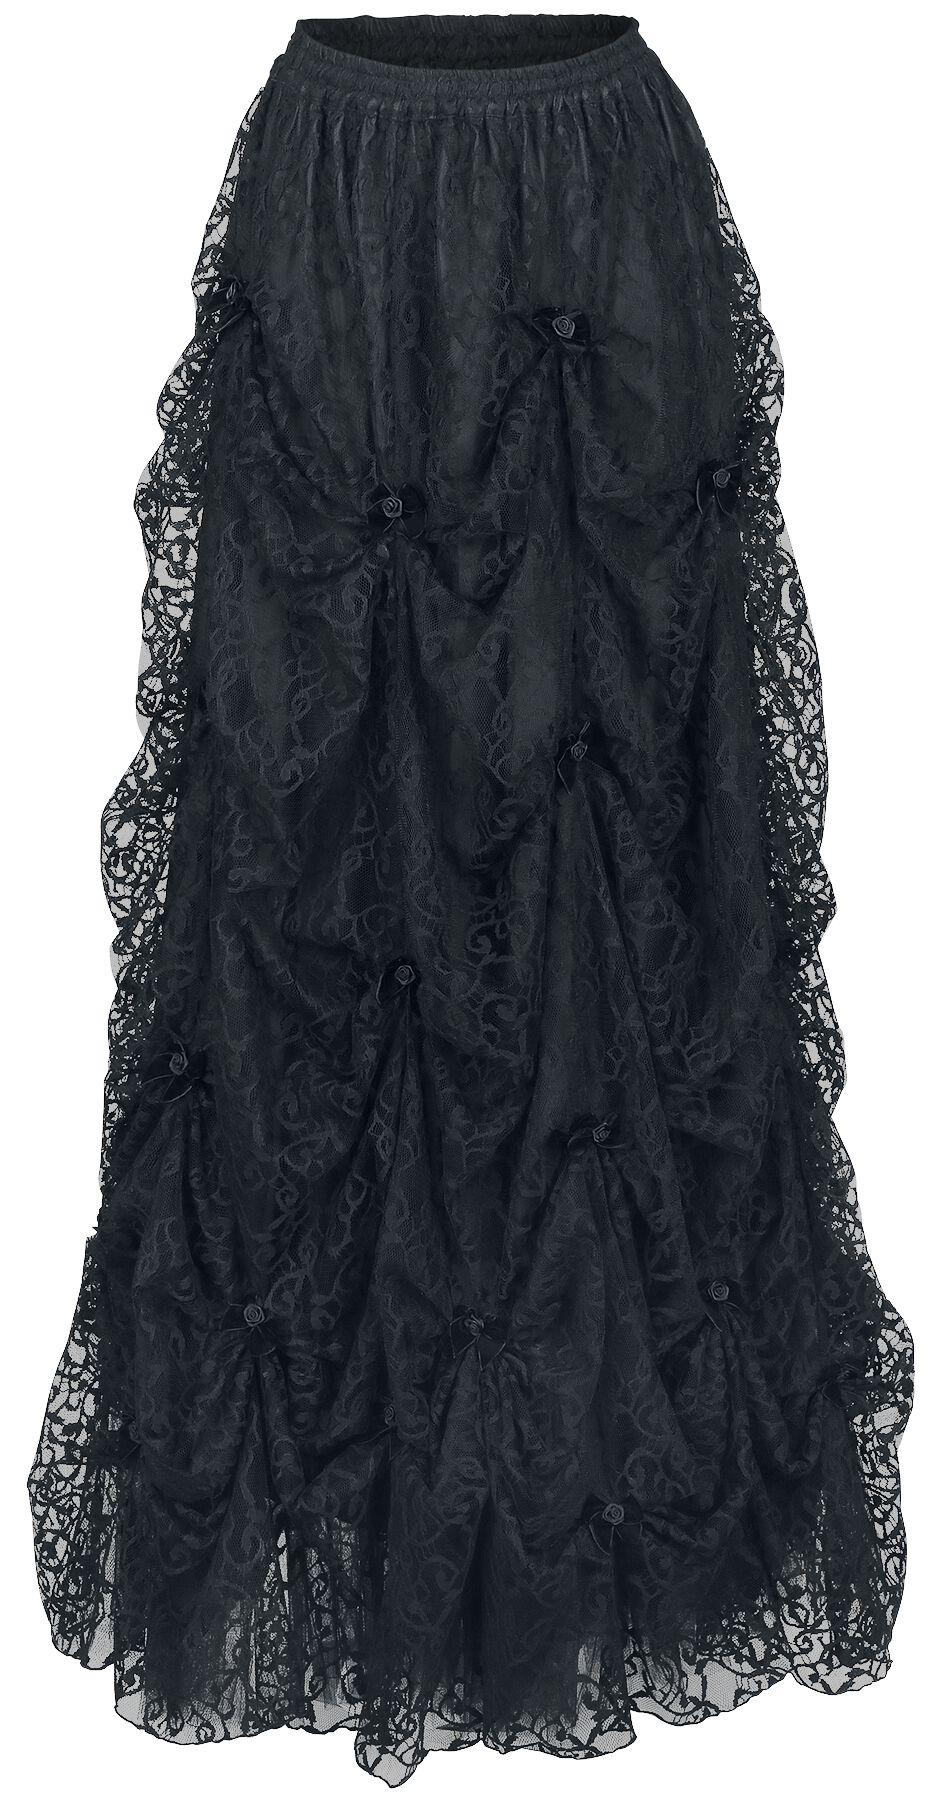 Image of   Sinister Gothic Long middelalderlig-nederdel Nederdel sort